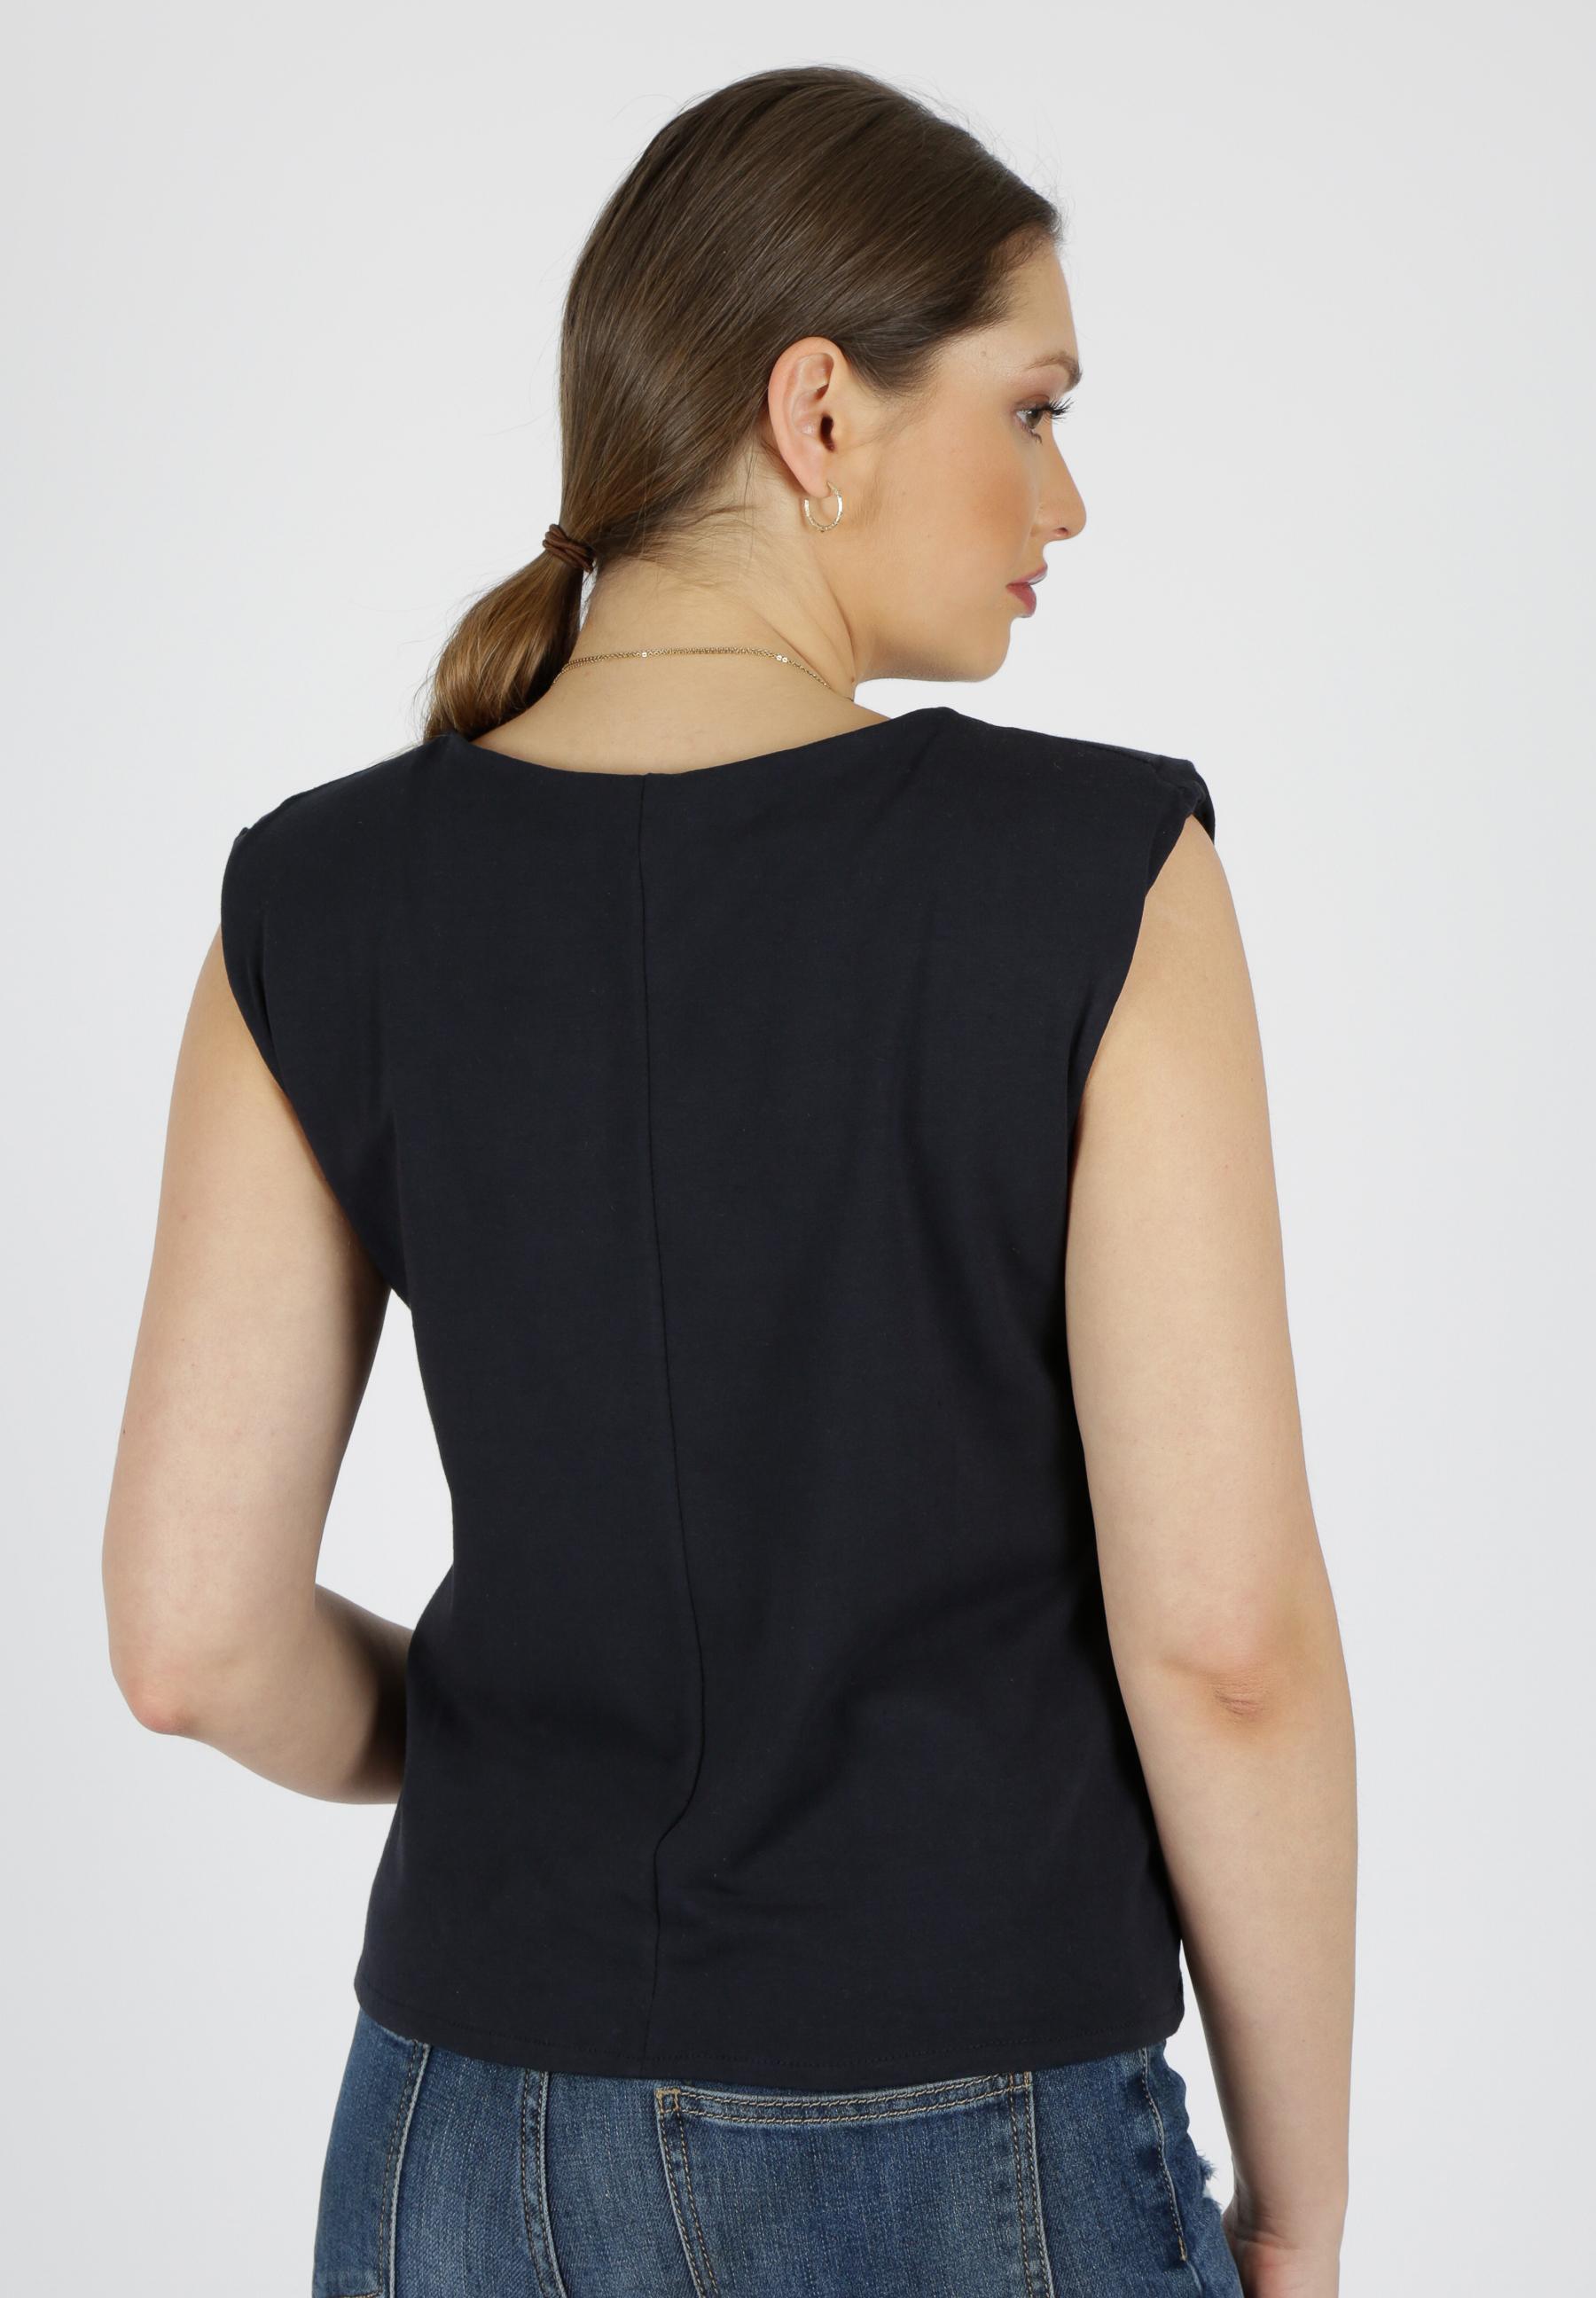 MiaZAYA Shirt Schulterpolster